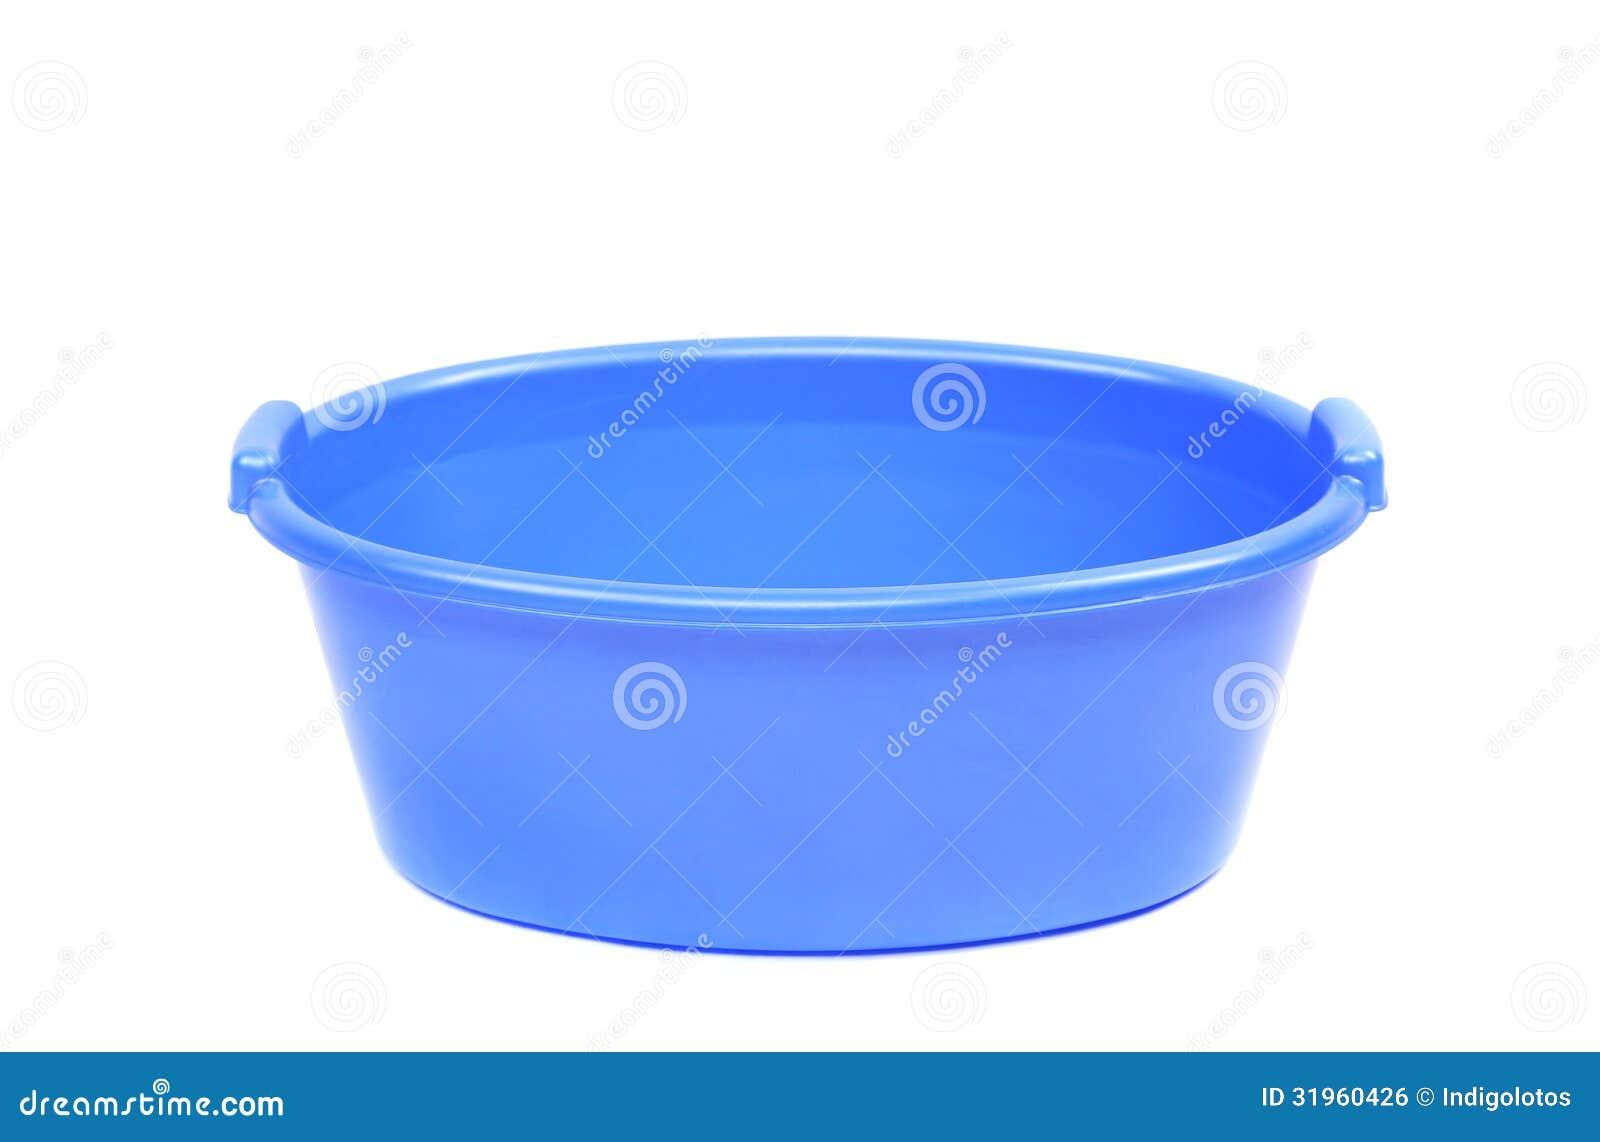 Laundry Bowl : Blue Plastic Wash Bowl Royalty-Free Stock Image CartoonDealer.com ...